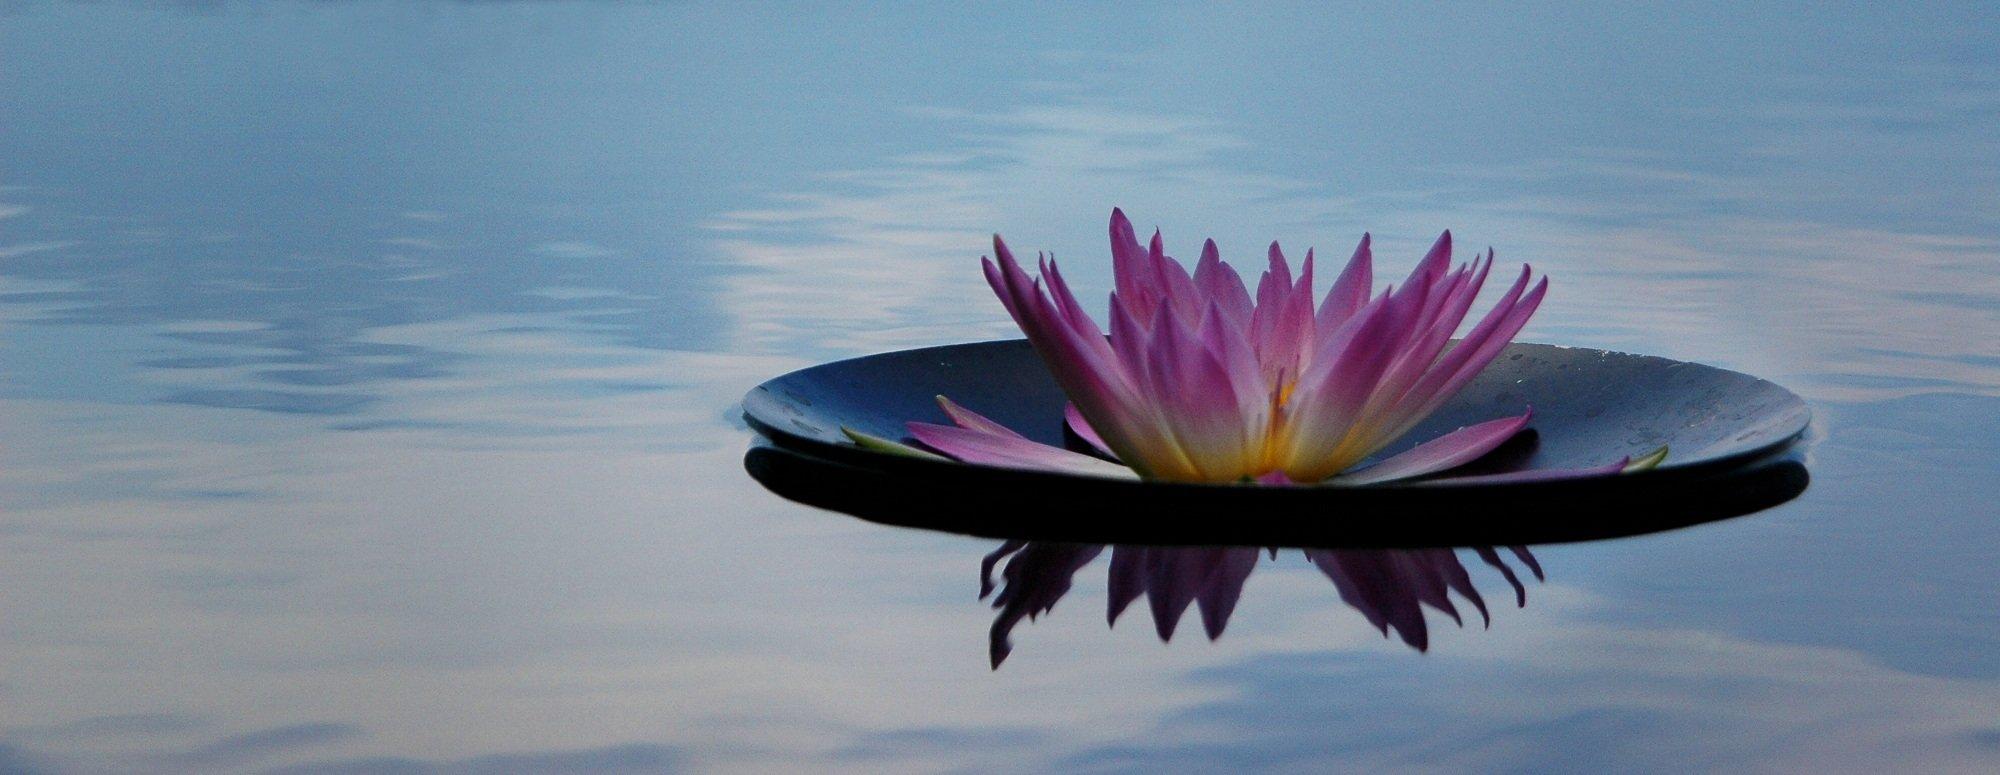 Meditation Makes Sense - The Live Sessions